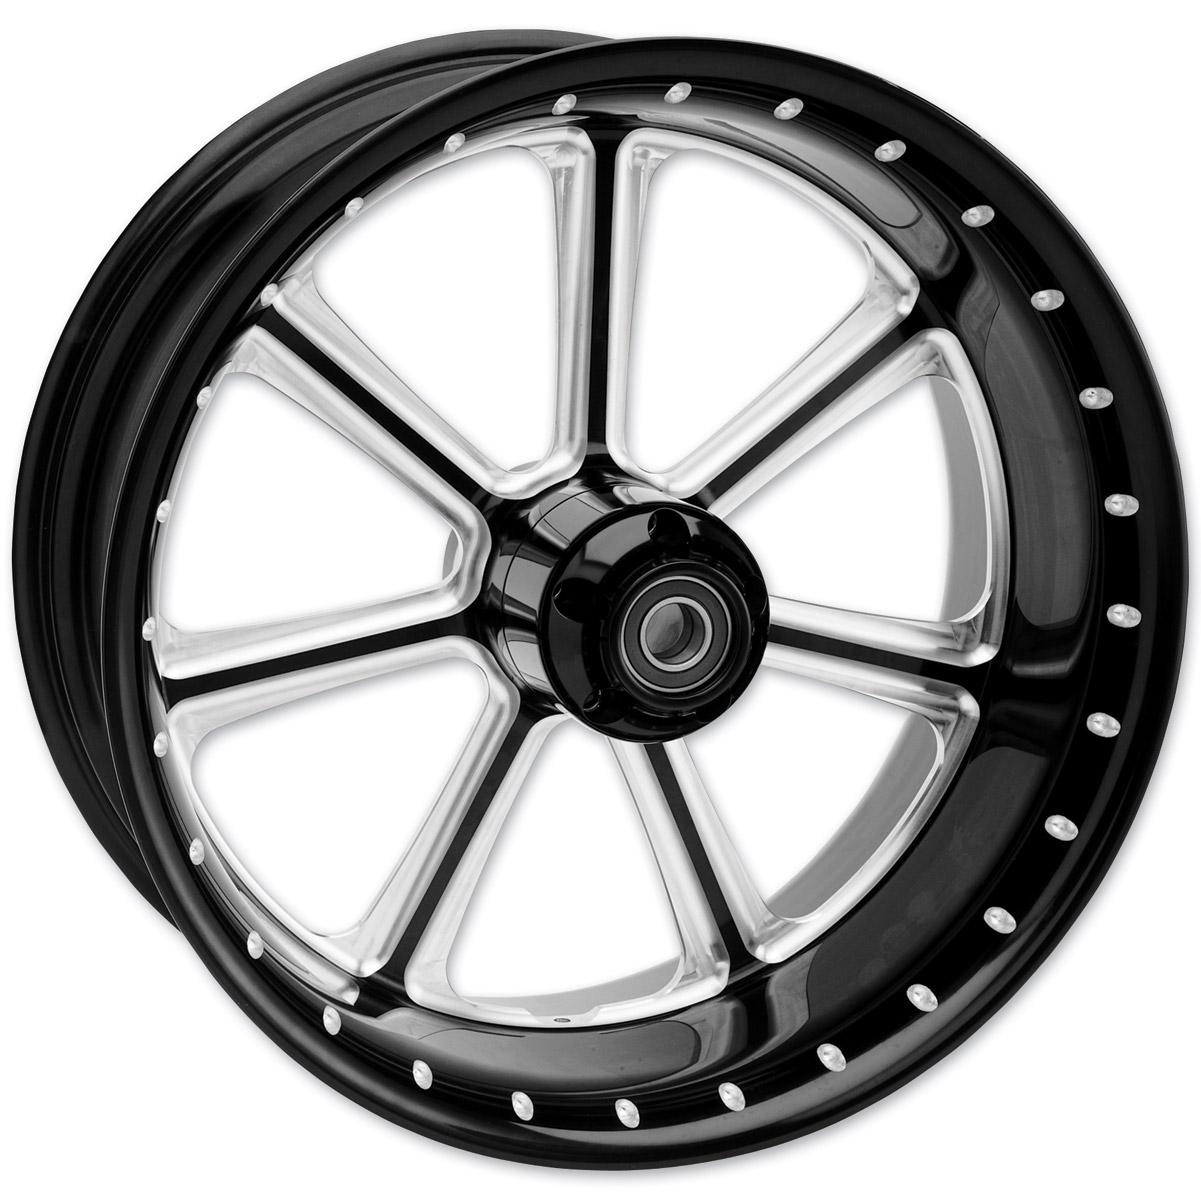 Roland Sands Design Contrast Cut Diesel Front Wheel, 19 x 2.15